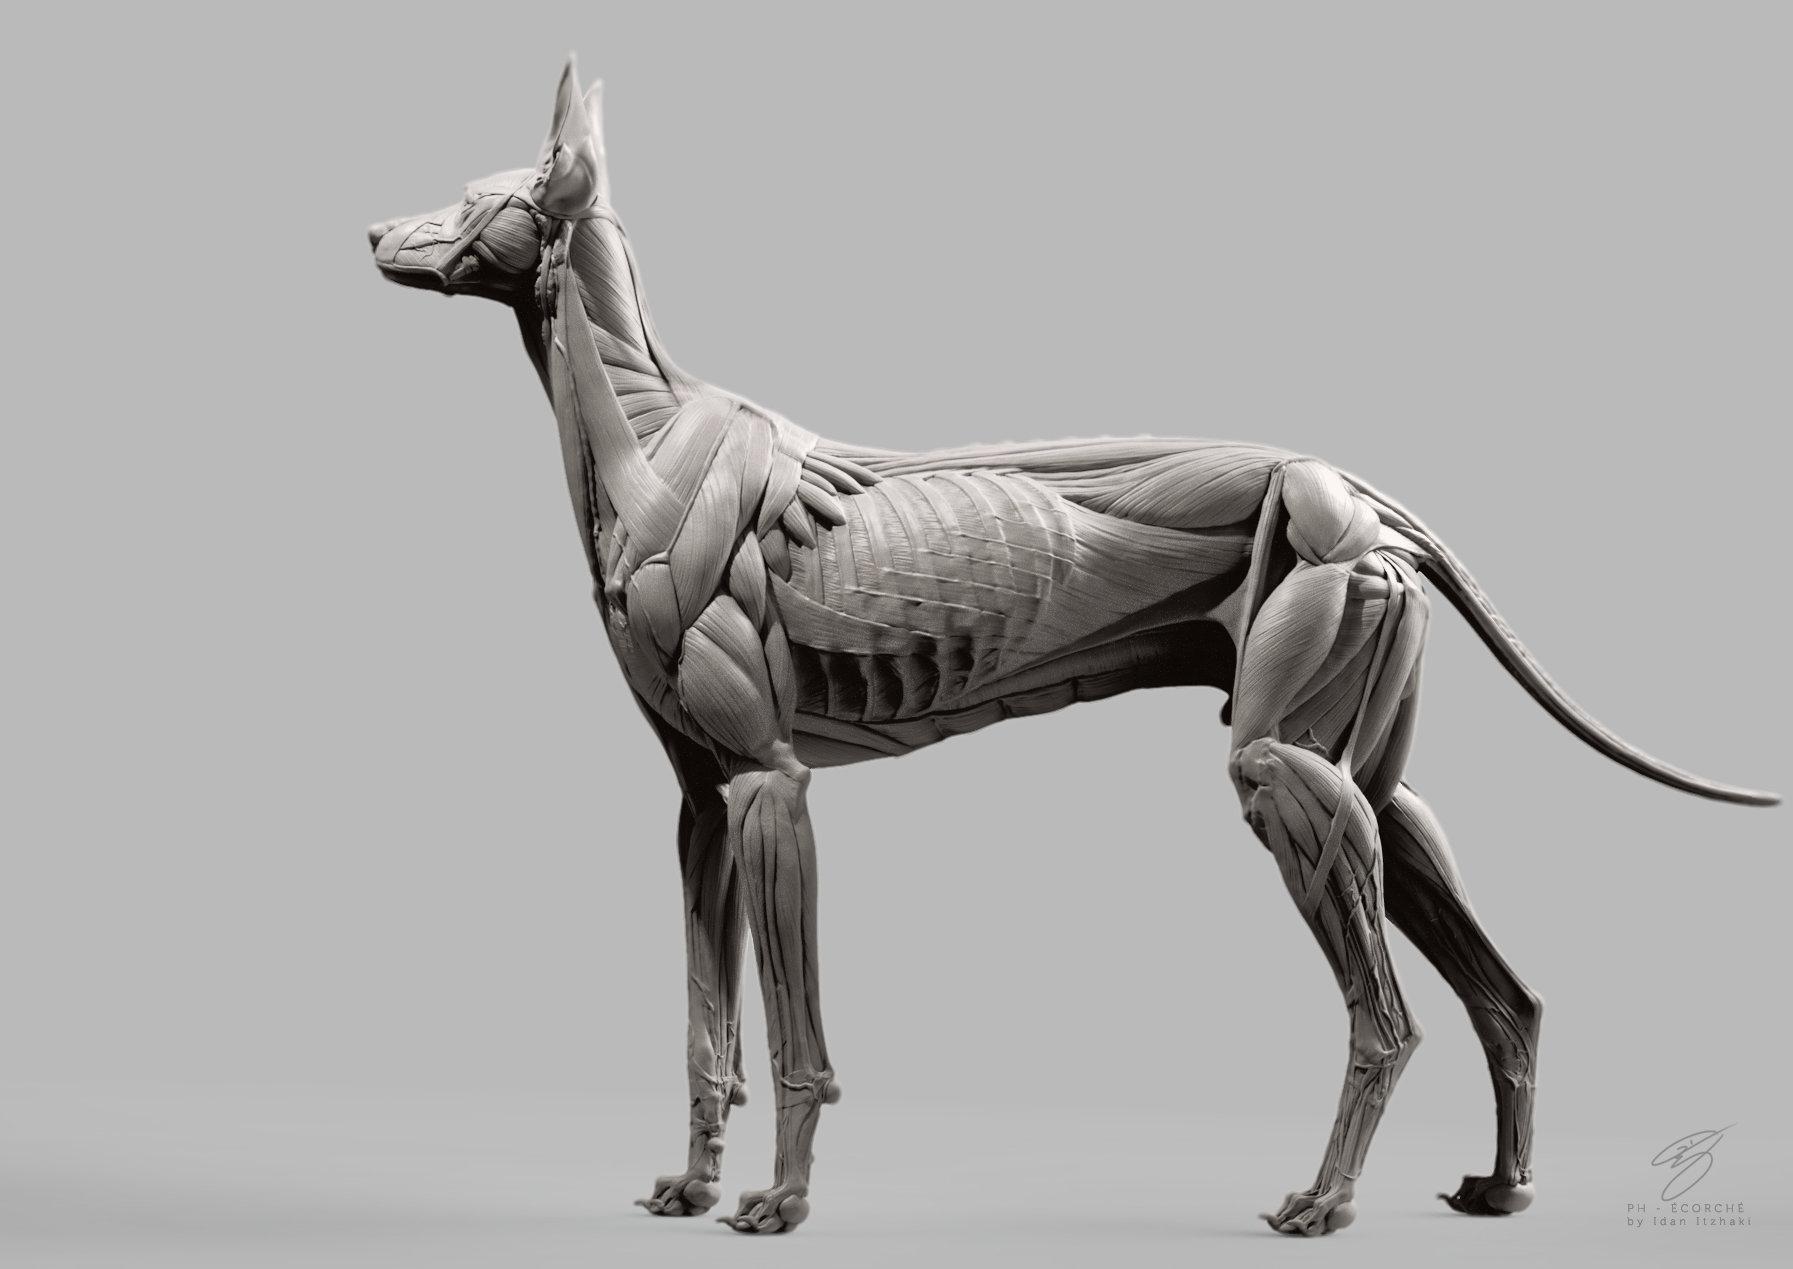 ArtStation - Canine Écorché, Idan Itzhaki